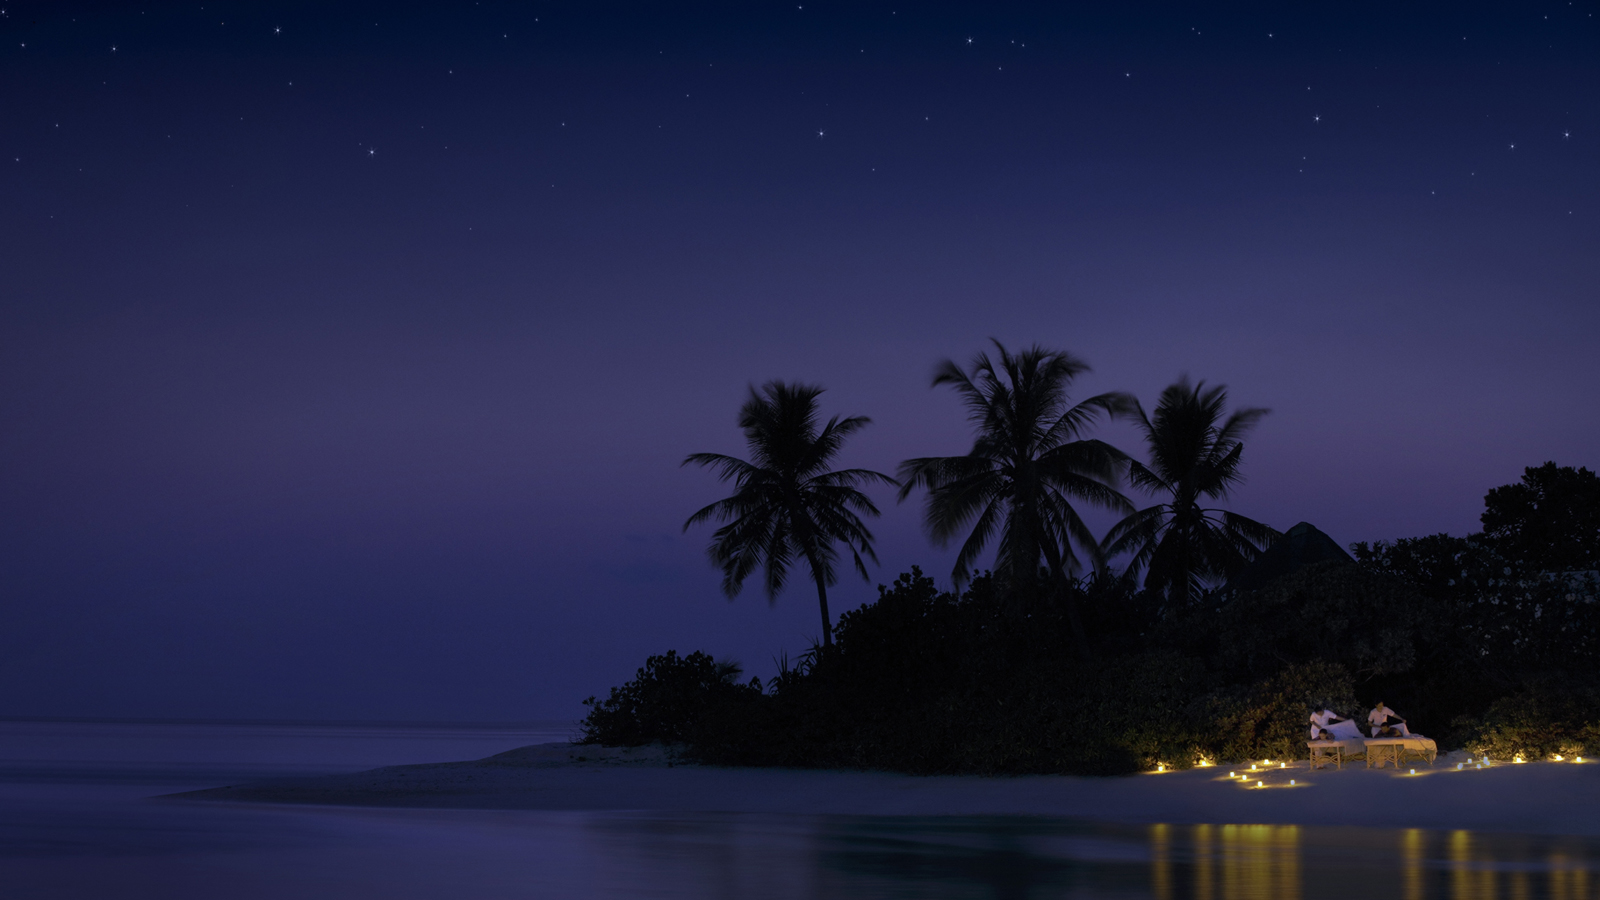 Secrets of the Sea at The Night Spa, Maldives